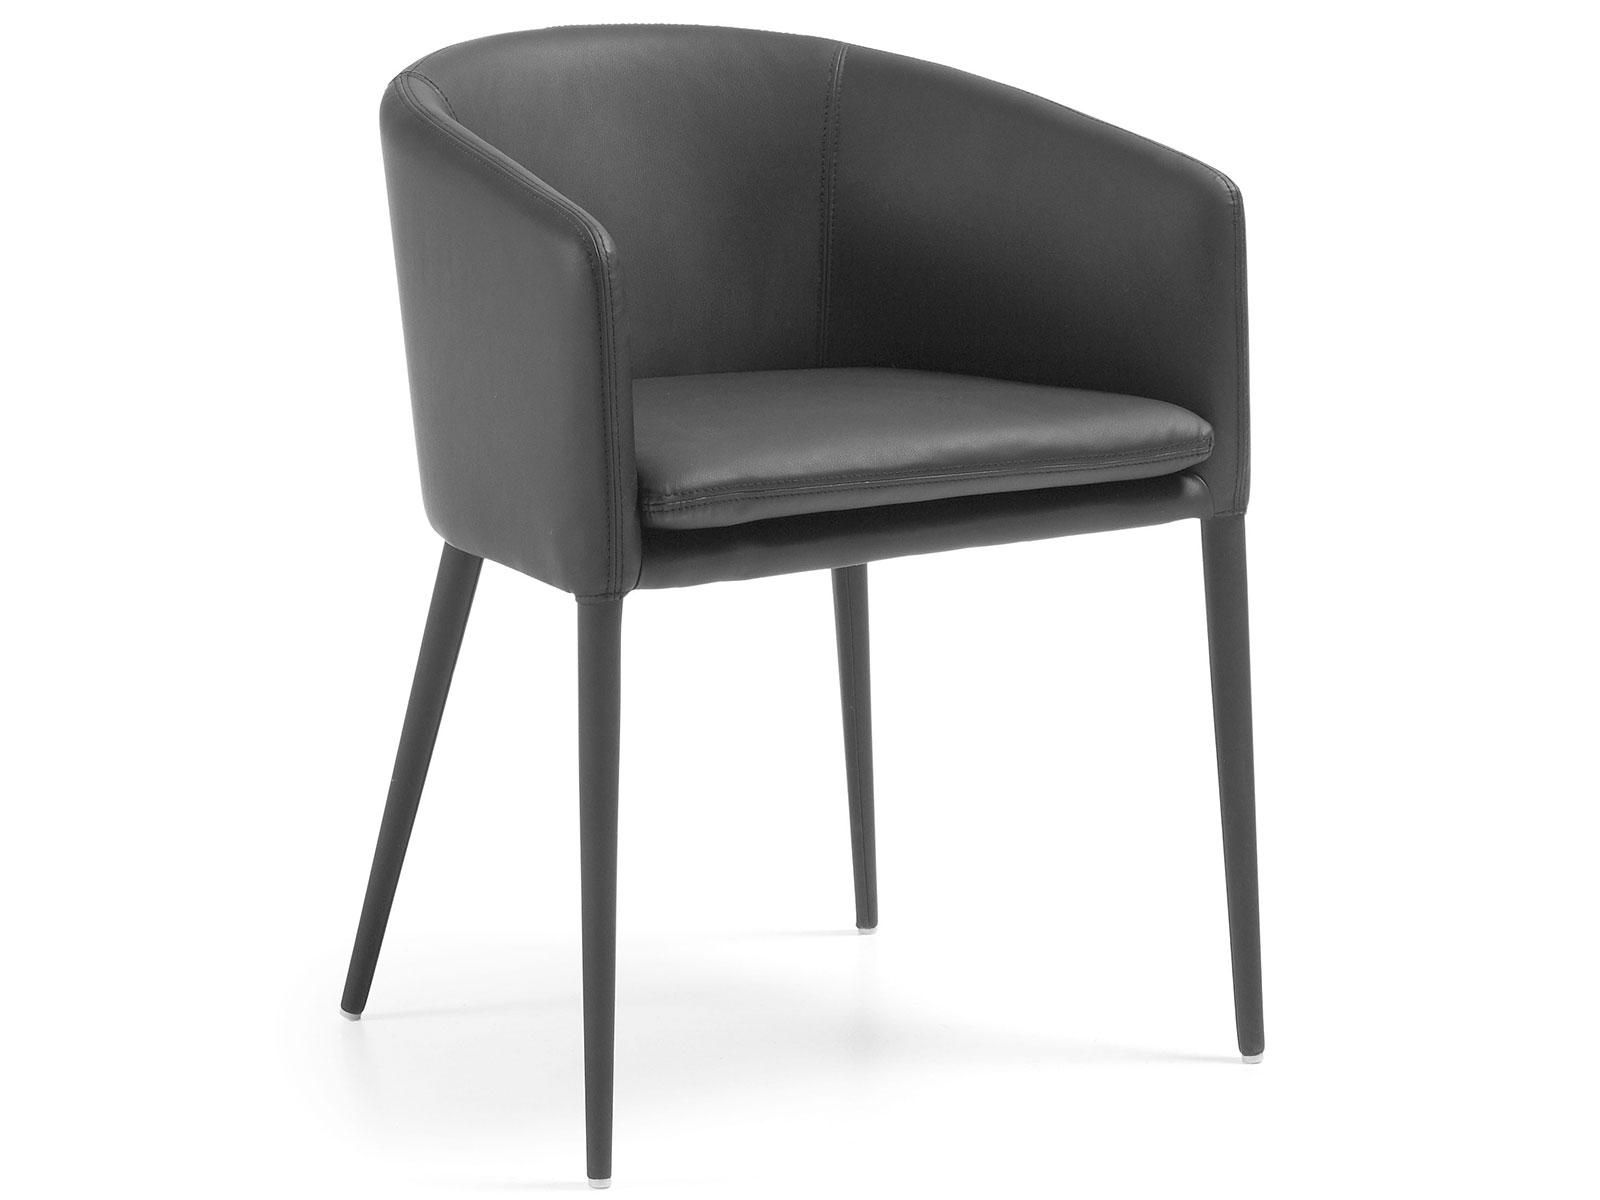 Silla Harmon Color Negro Compra Sillas De Dise O Online